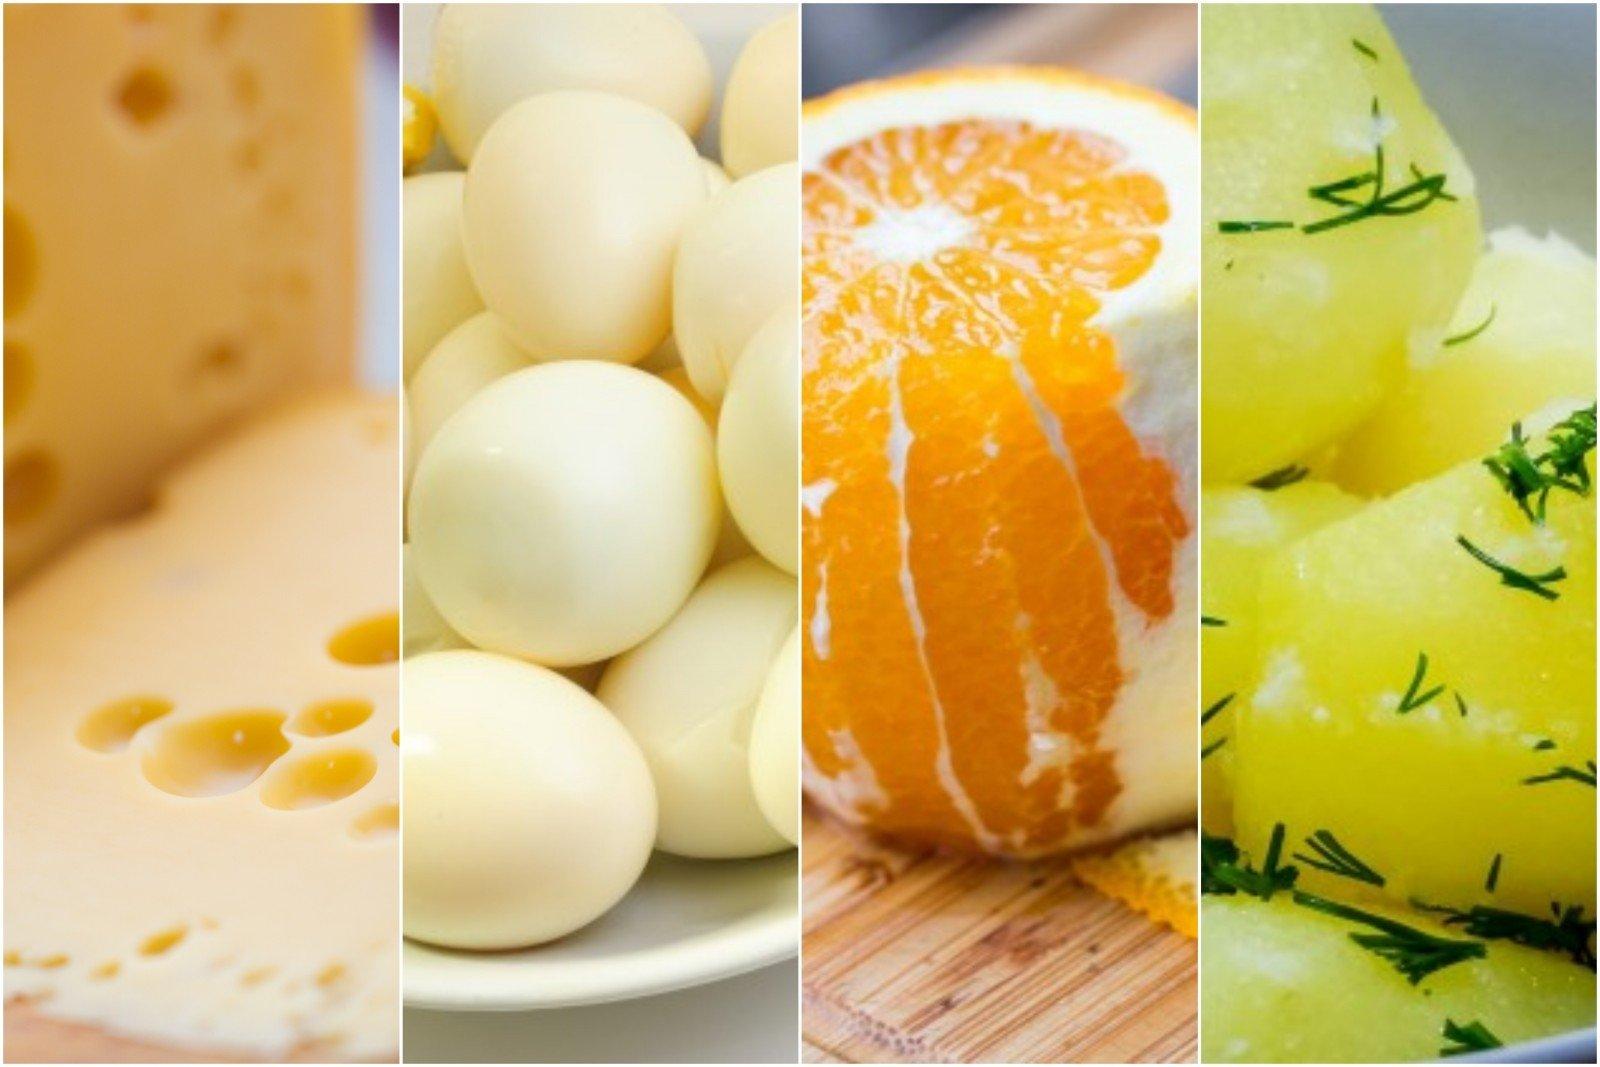 mažai druskos turinti dieta sergant hipertenzija)